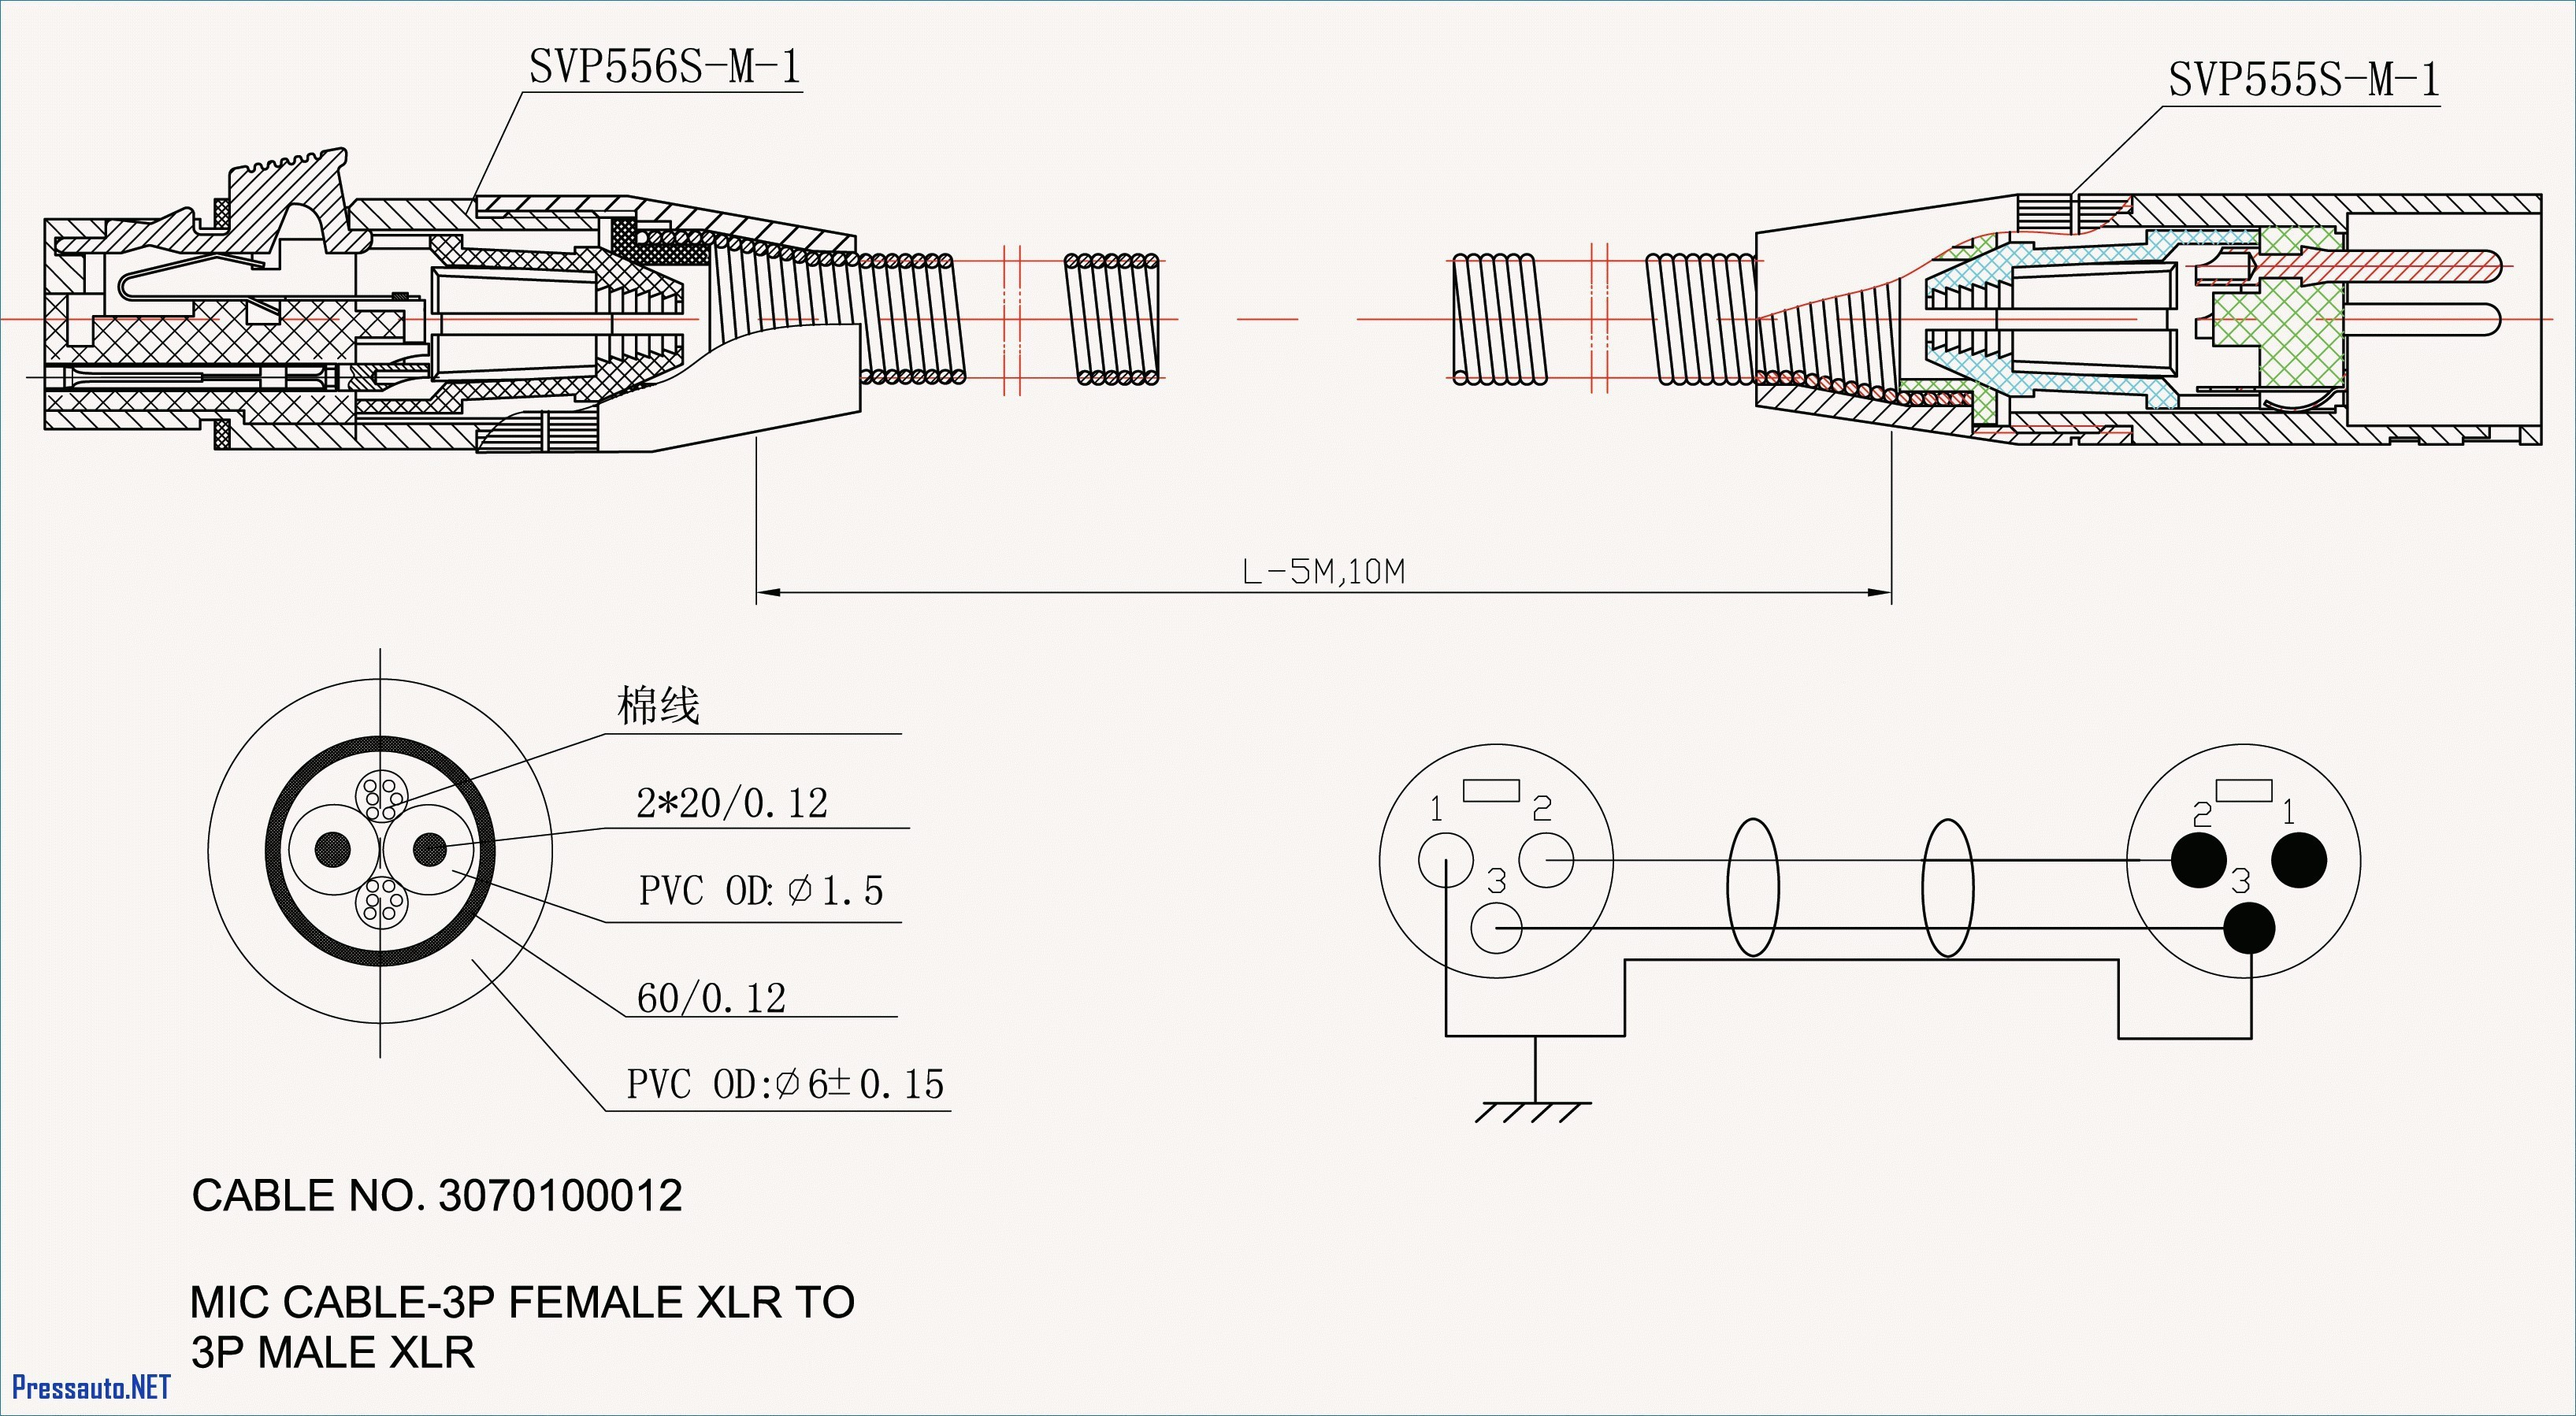 Car Ignition Switch Wiring Diagram Car Ignition Switch Wiring Diagram Pickenscountymedicalcenter Of Car Ignition Switch Wiring Diagram Komatsu Ignition Switch Wiring Diagram New E30 Alternator Wire